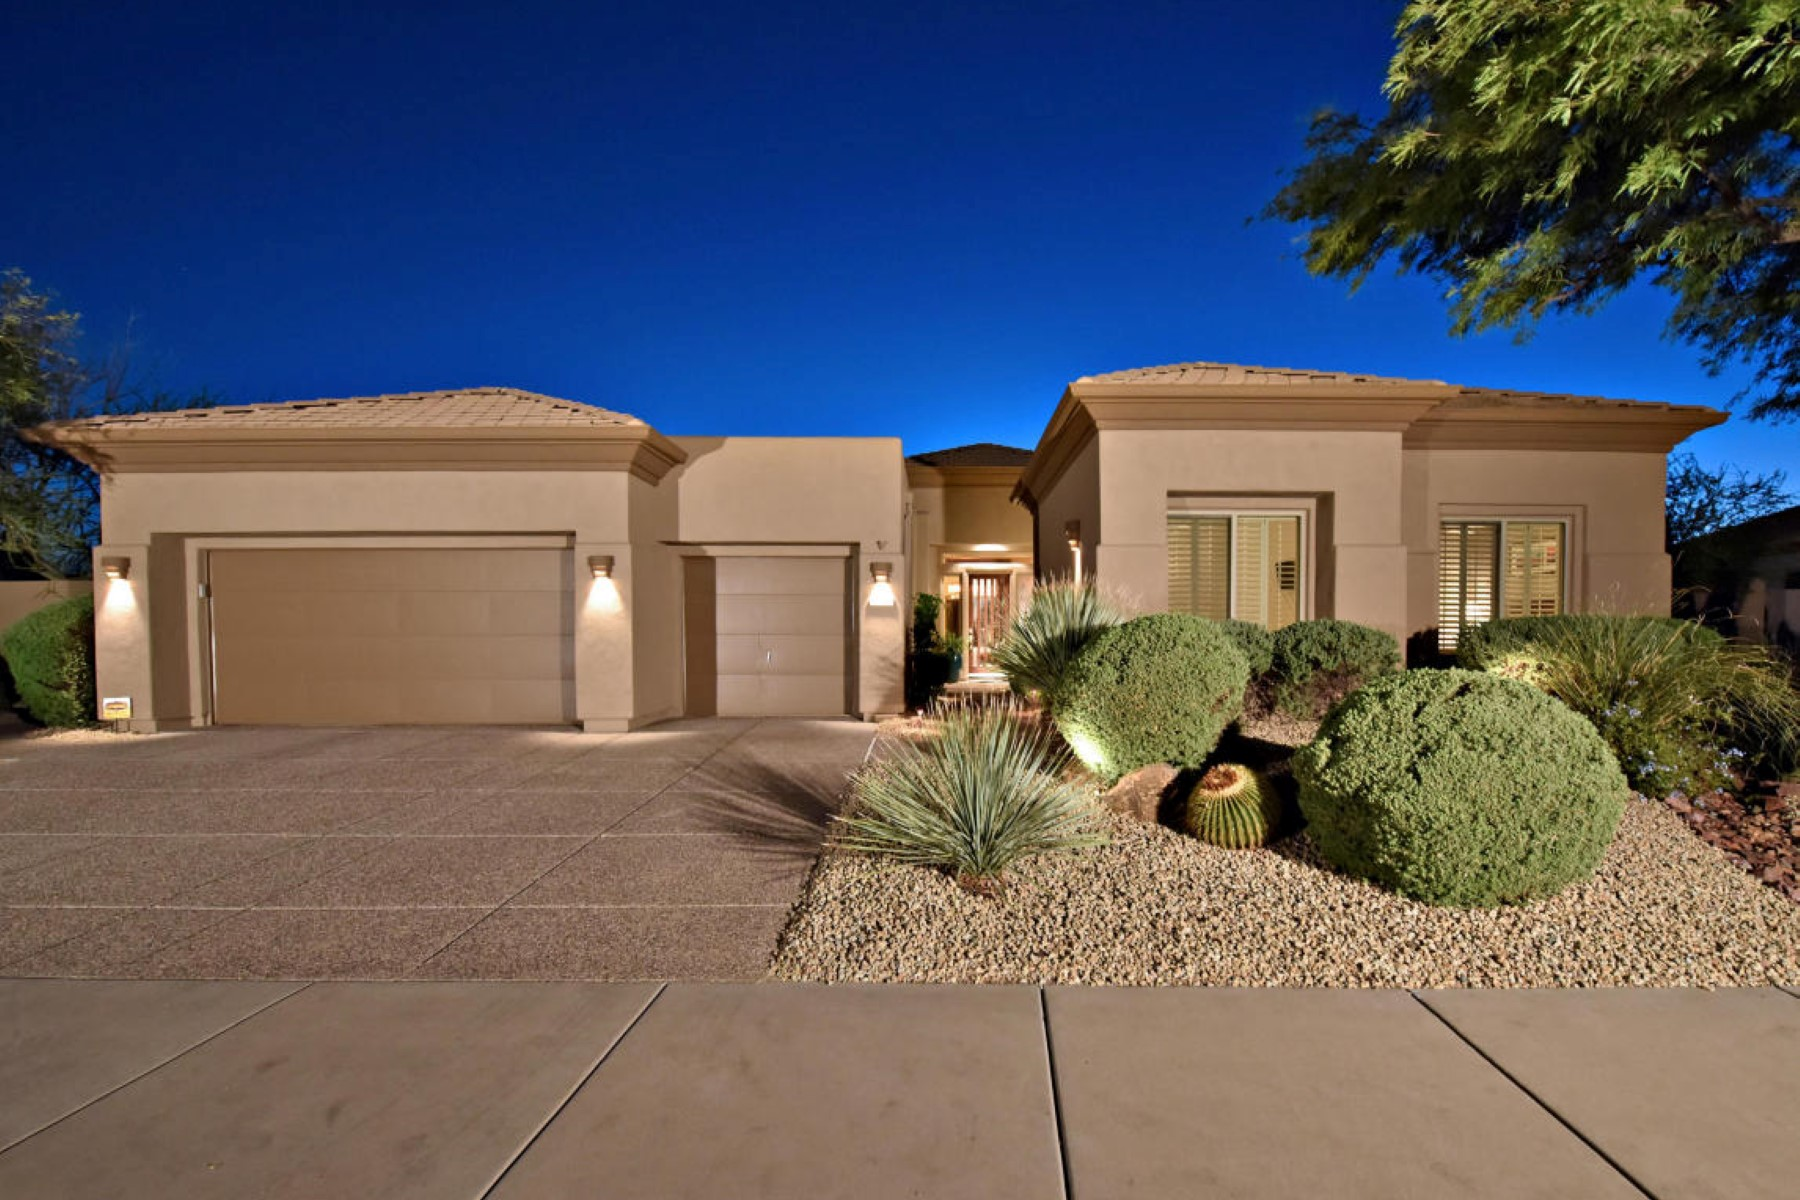 Tek Ailelik Ev için Satış at Lovely home wih an expanded Ventus model with private entry Casita 33618 N 64th Pl Scottsdale, Arizona 85266 Amerika Birleşik Devletleri